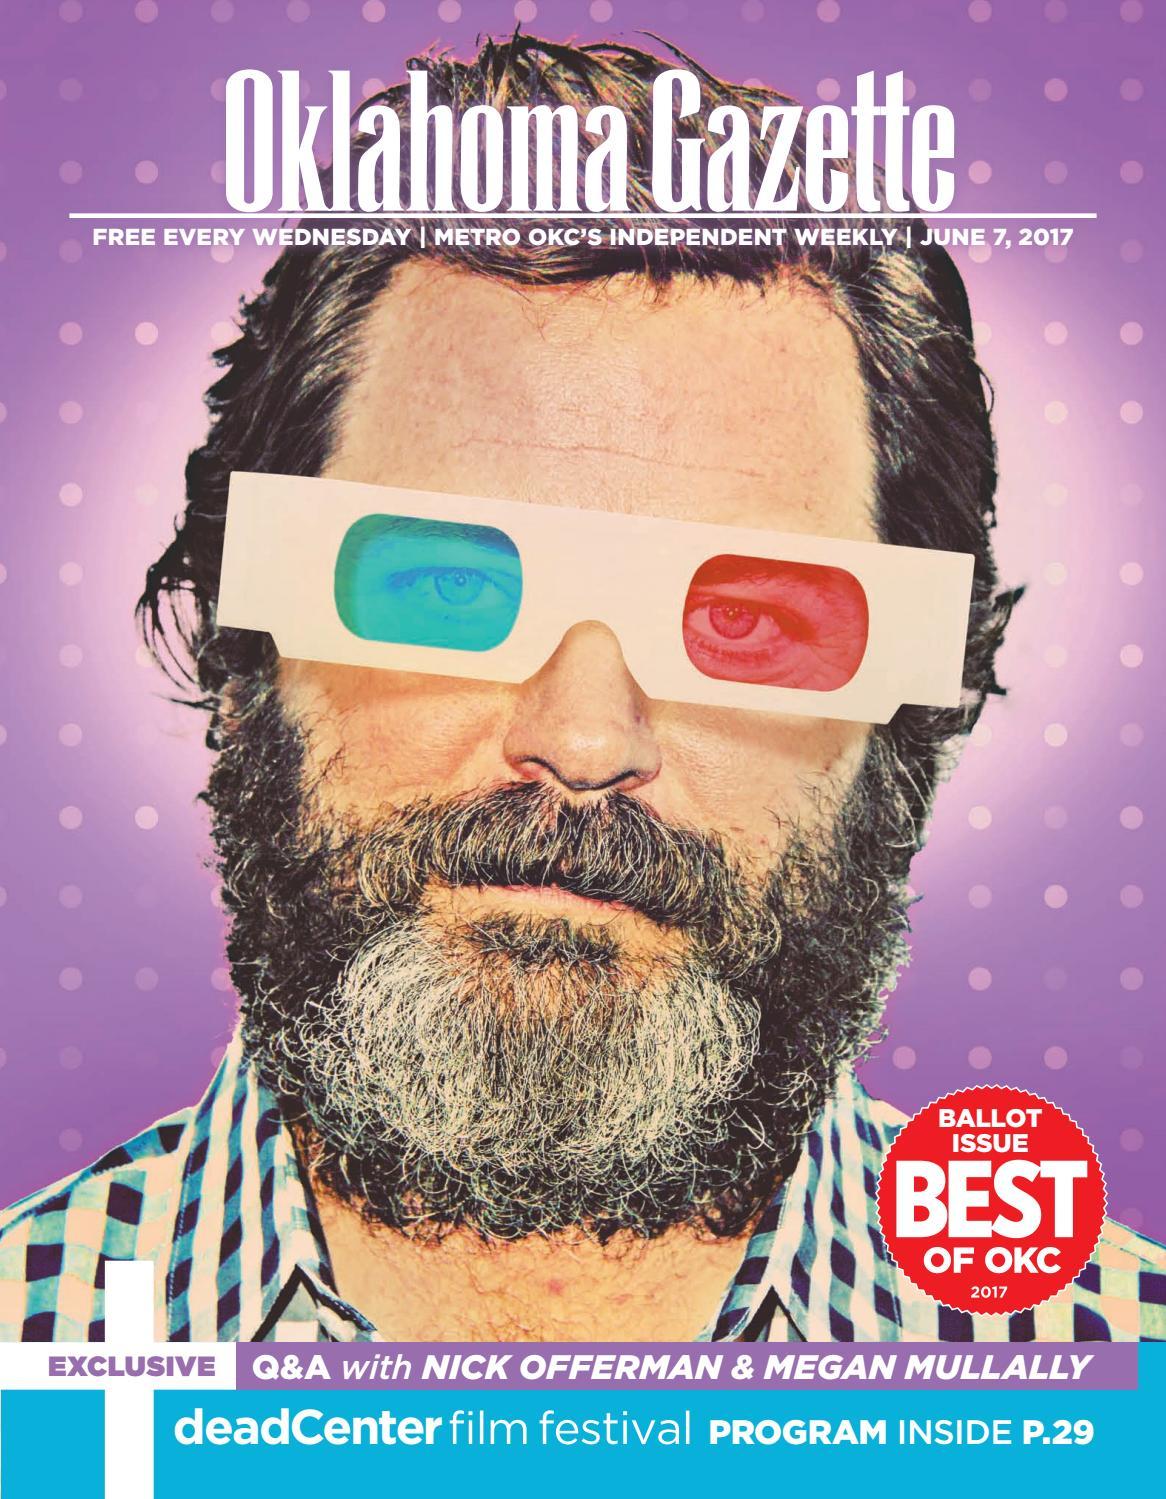 db07914b04 deadCenter Film Festival by Oklahoma Gazette - issuu